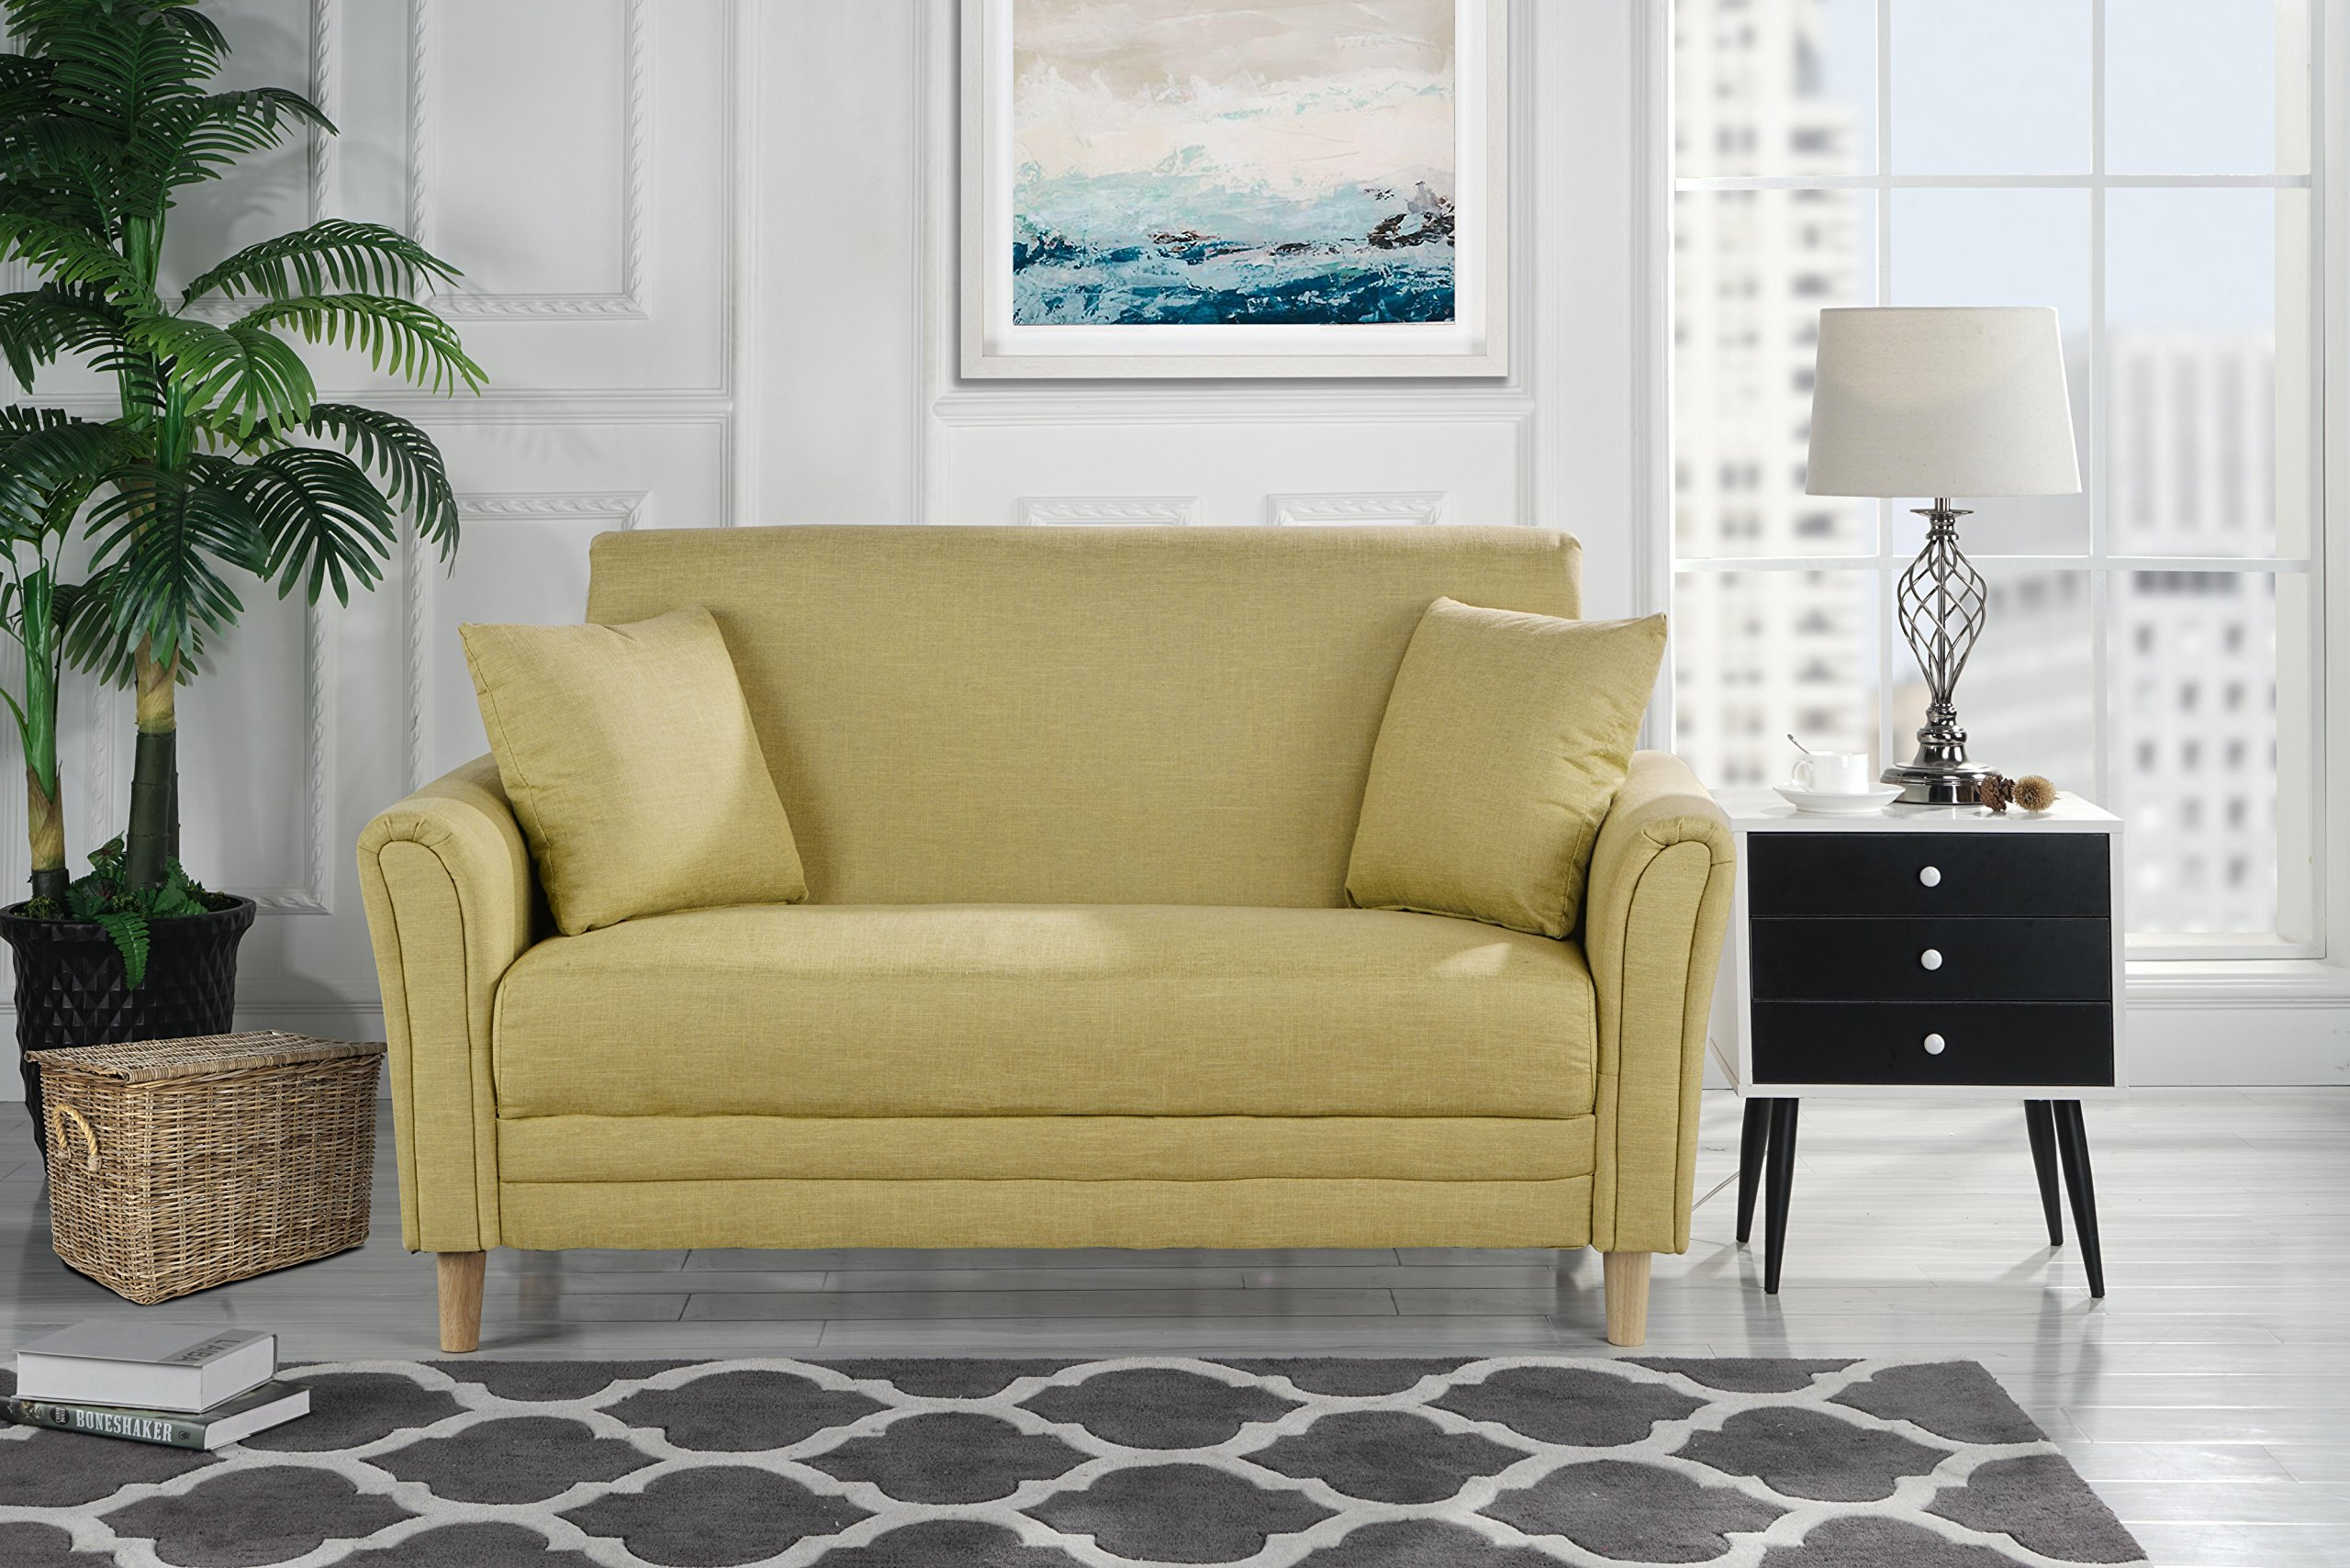 AODAILIHB Modern Soft Cloth Tufted Cushion Loveseat Sofa ...